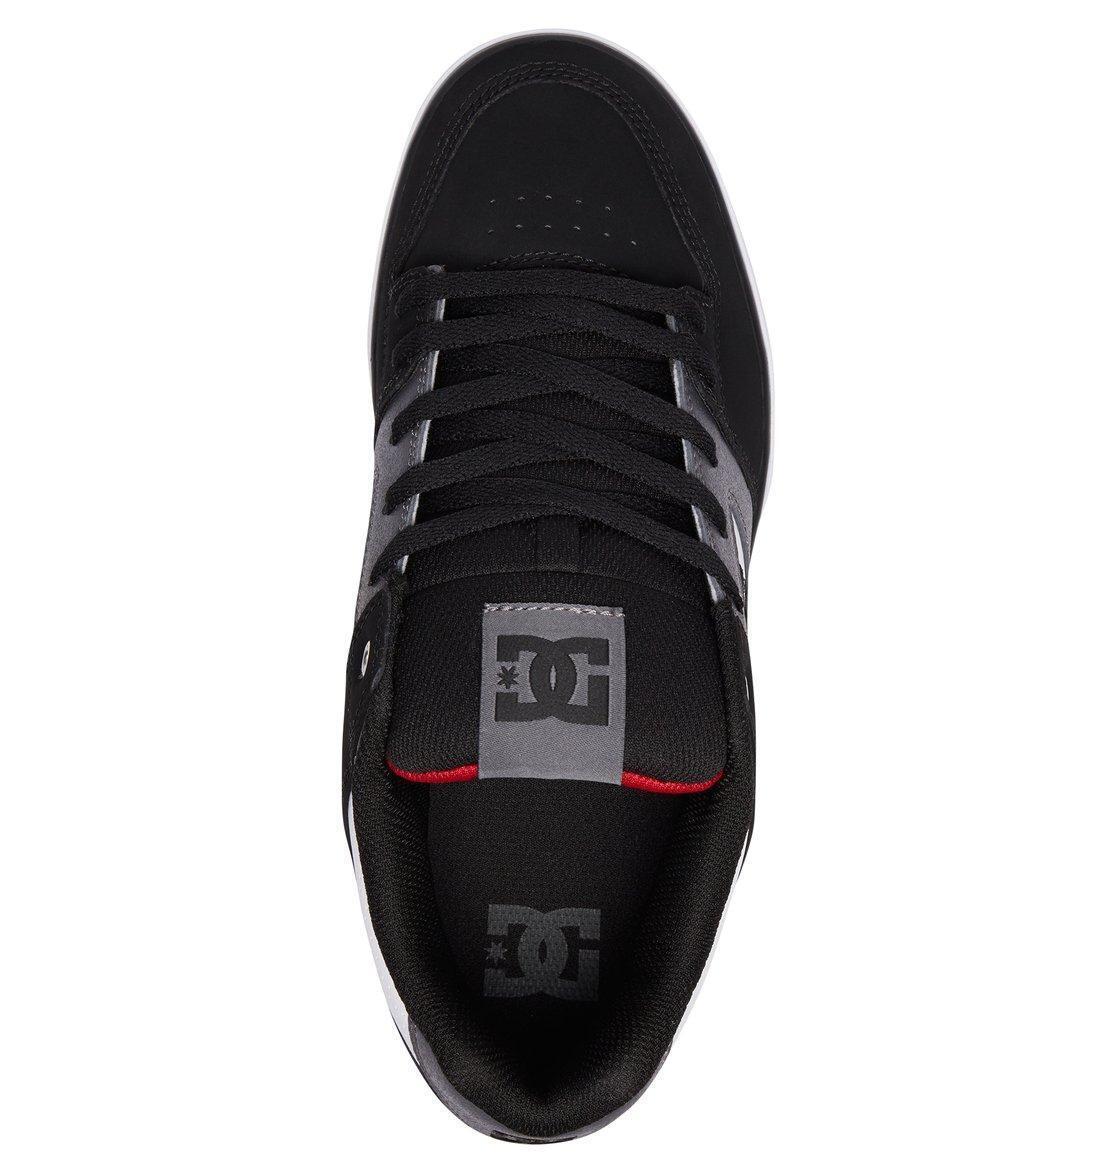 DC SKATE Schuhe  Herren TRAINERS.PURE BLACK/ROT/Weiß LEATHER PADDED SKATE DC Schuhe 8S 60 XWK c361bb